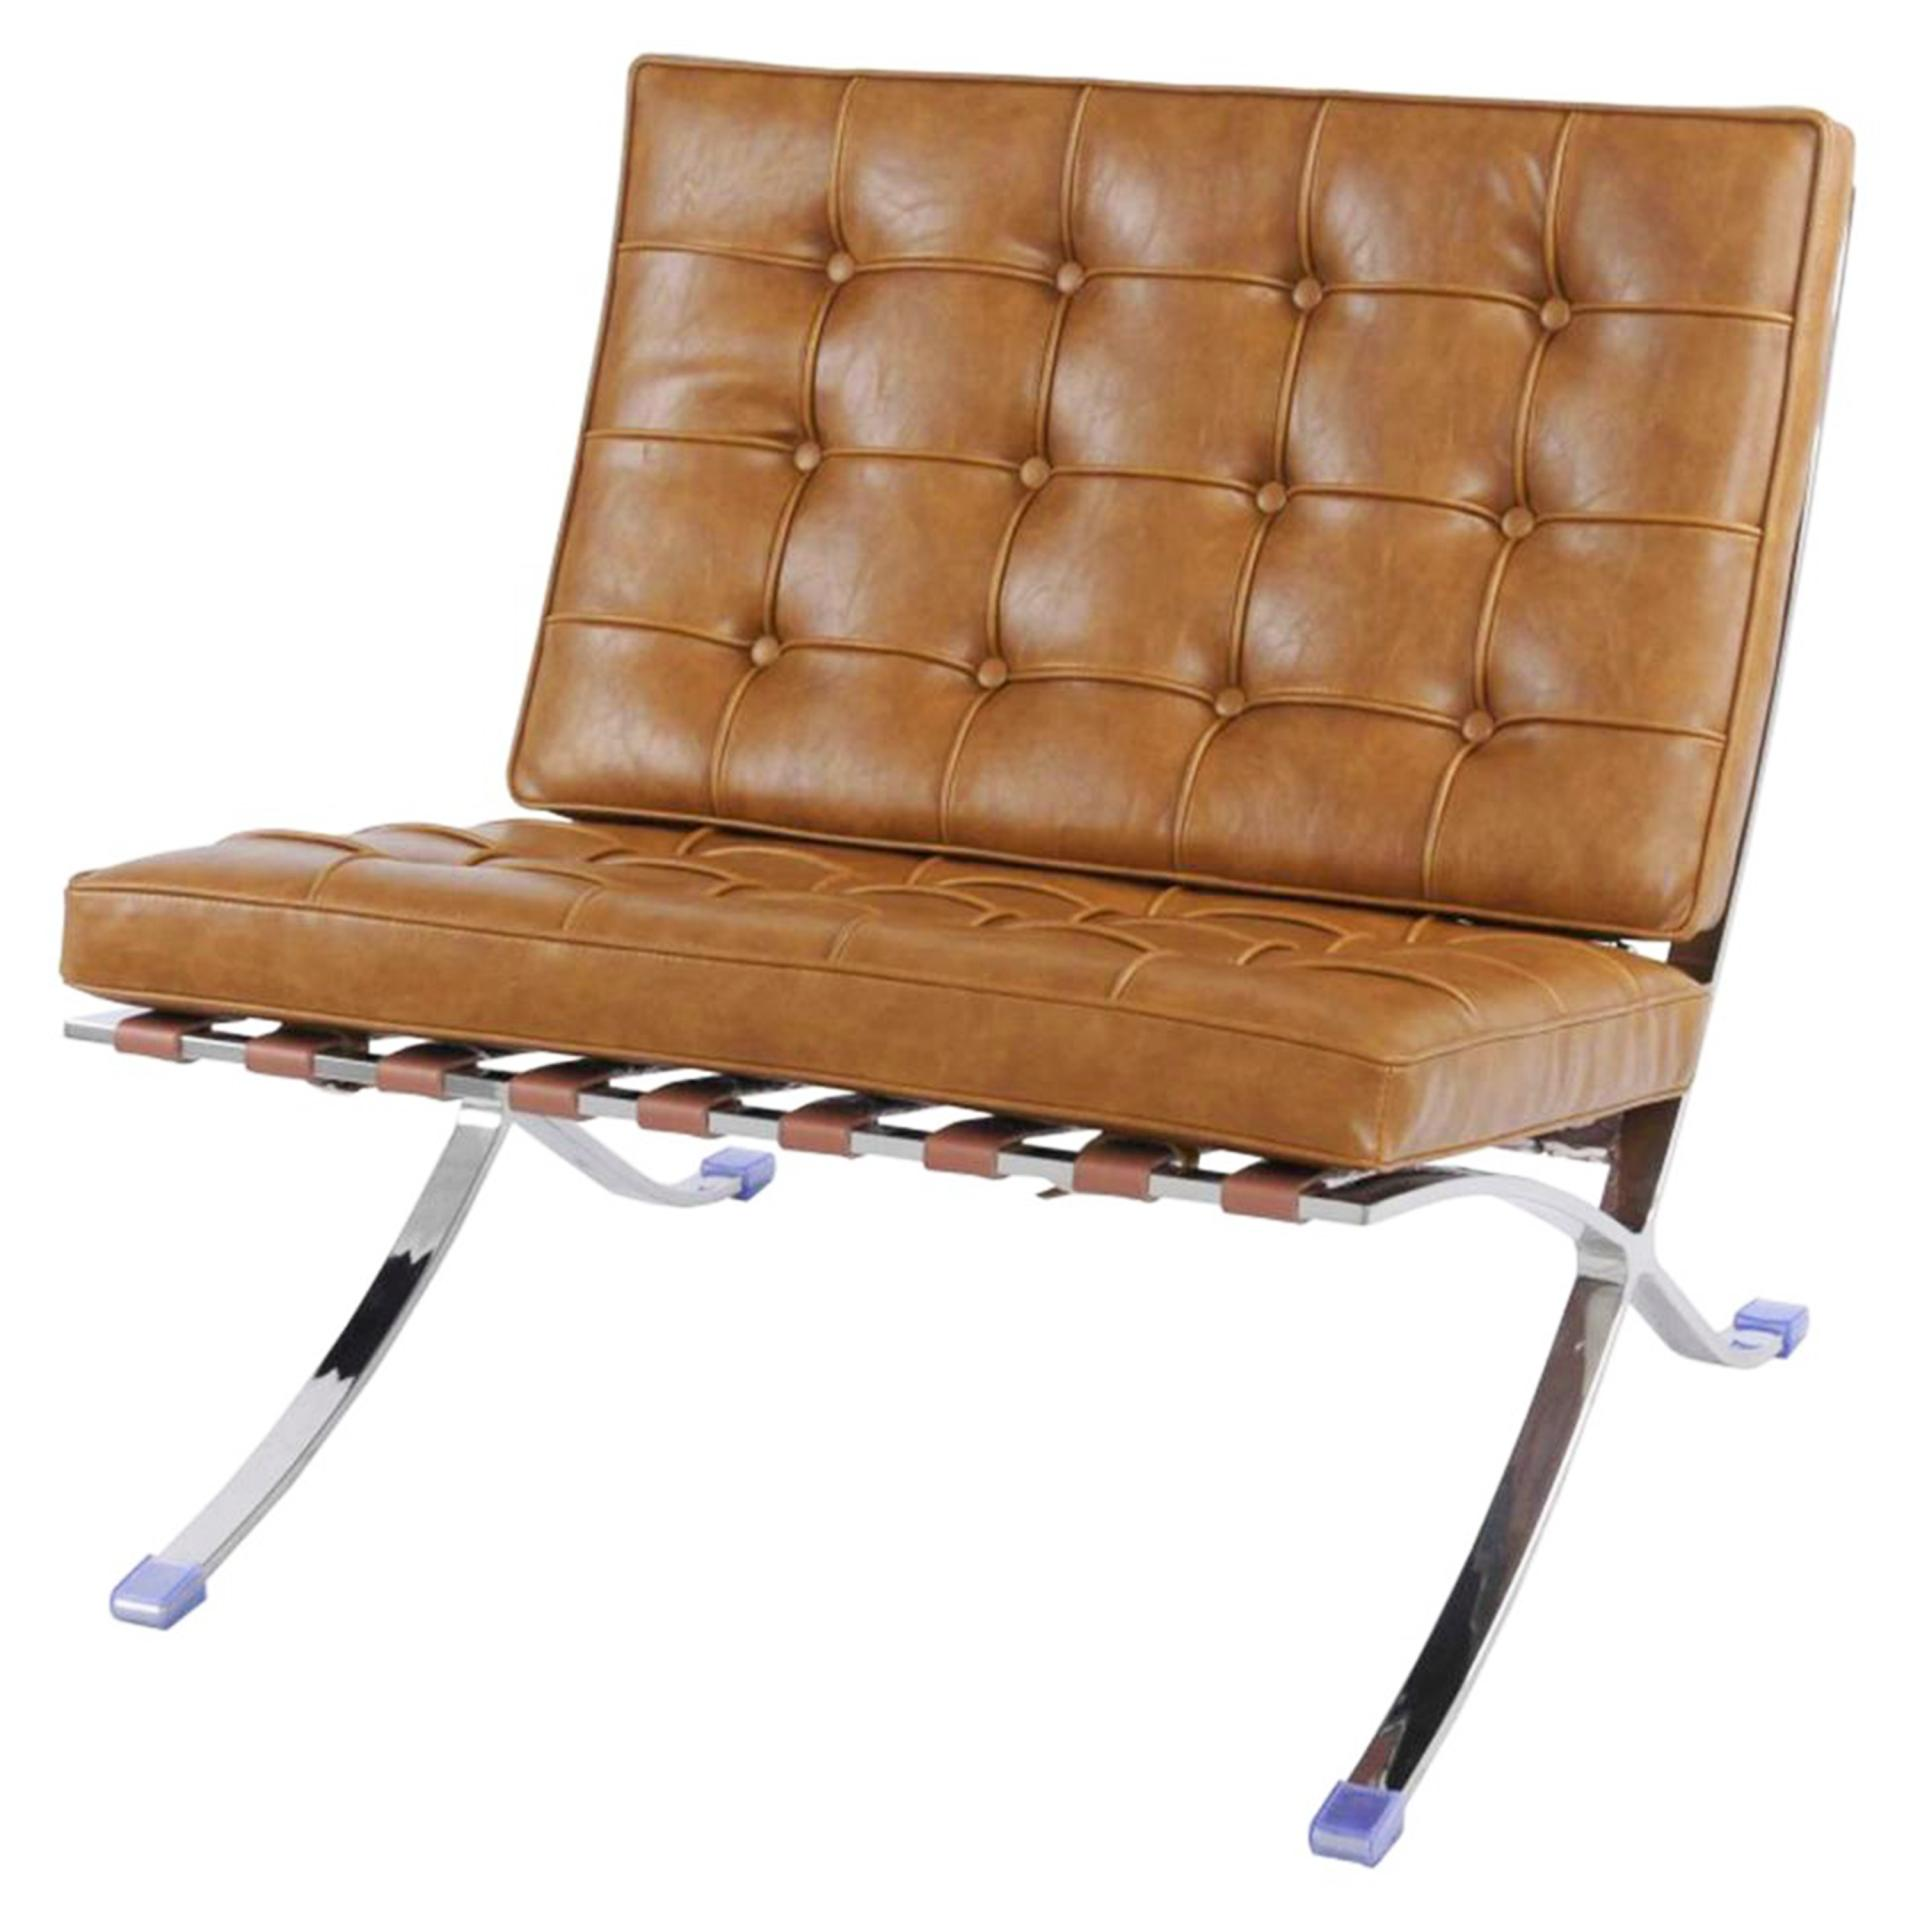 6300005-D1 - NPD Home Furniture | Wholesale Lifestyle